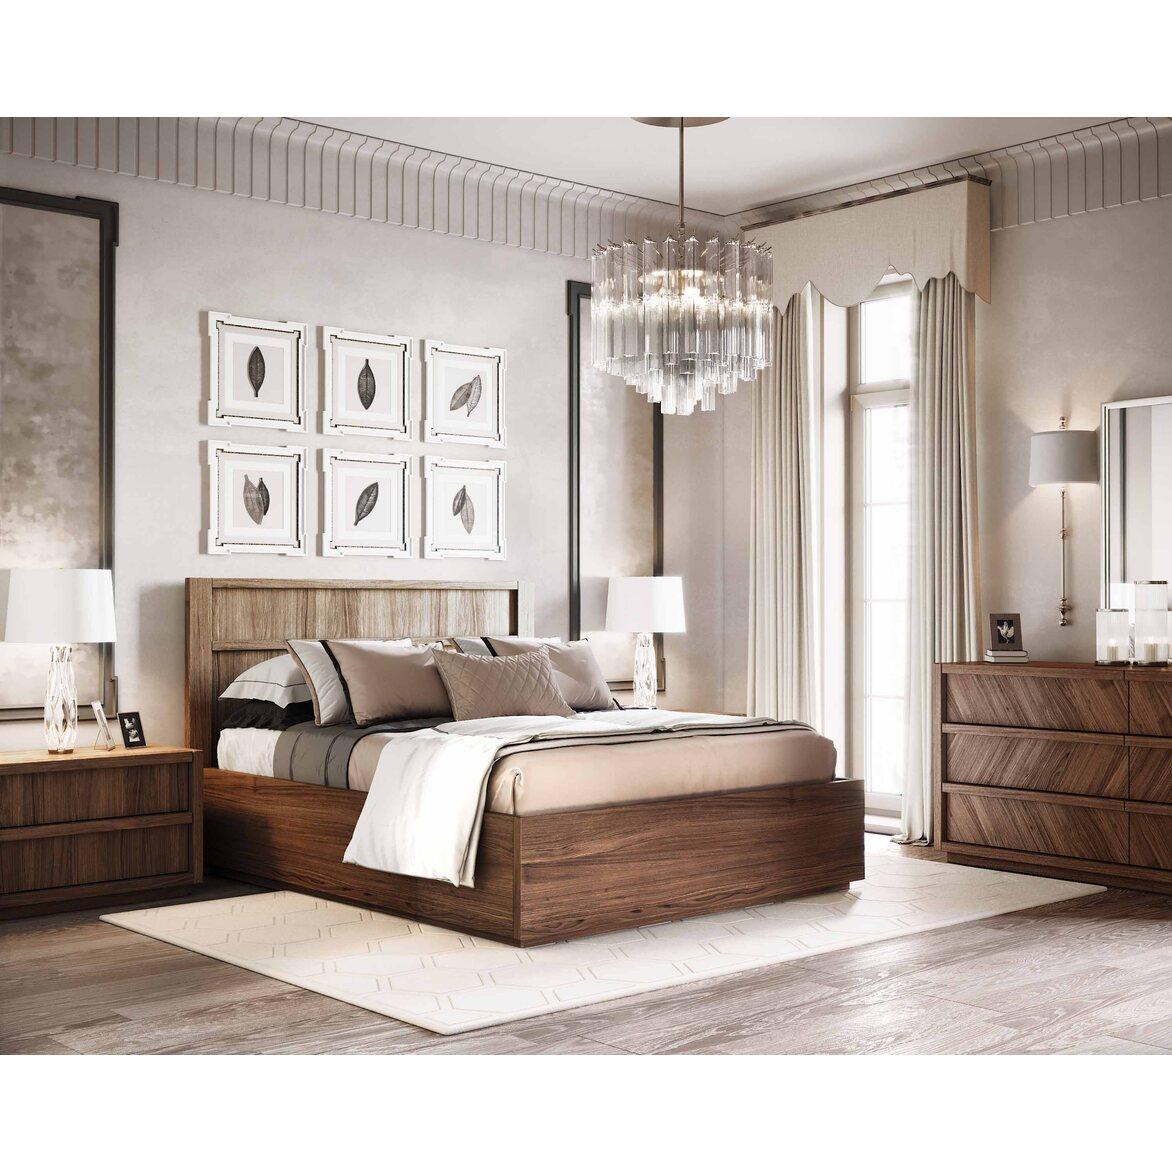 "Кровать 180*200 ""Brenson"" 4 | Двуспальные кровати Kingsby"